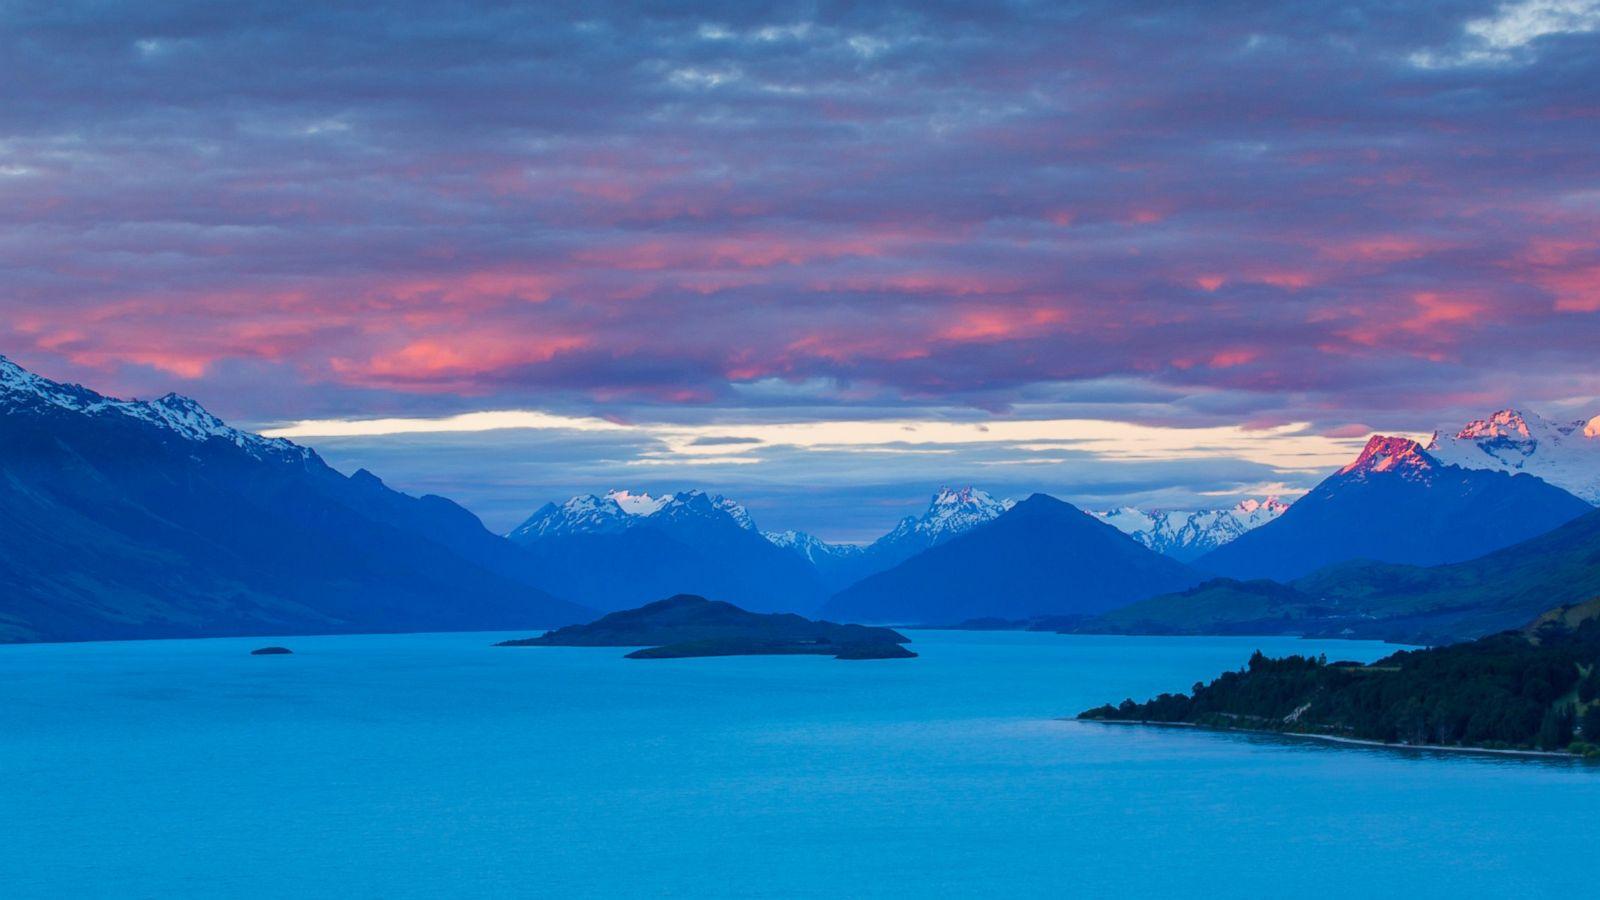 Mound Tasmand New Zealand Wallpaper Hd Wallpapers Home Screen